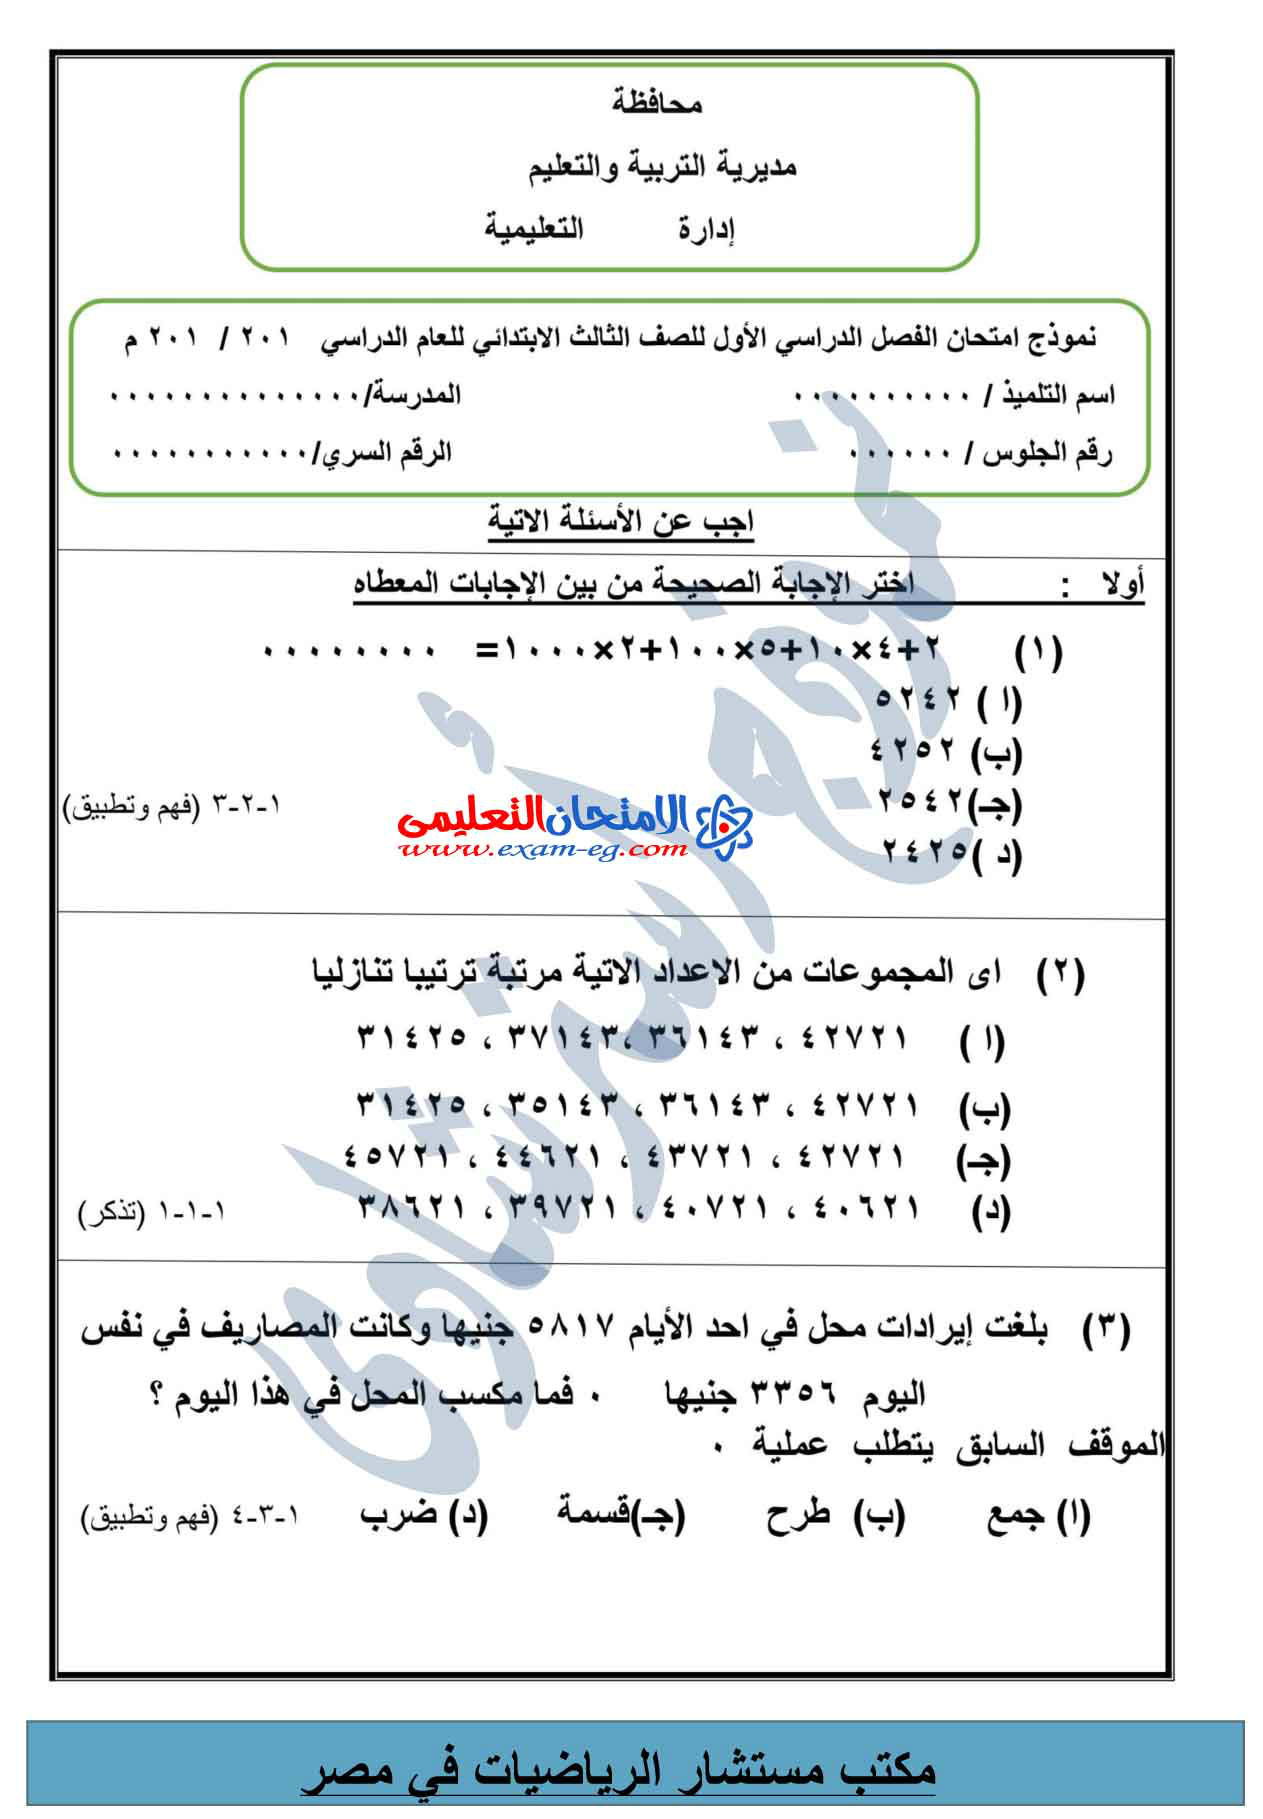 exam-eg.com_14492420352415.jpg